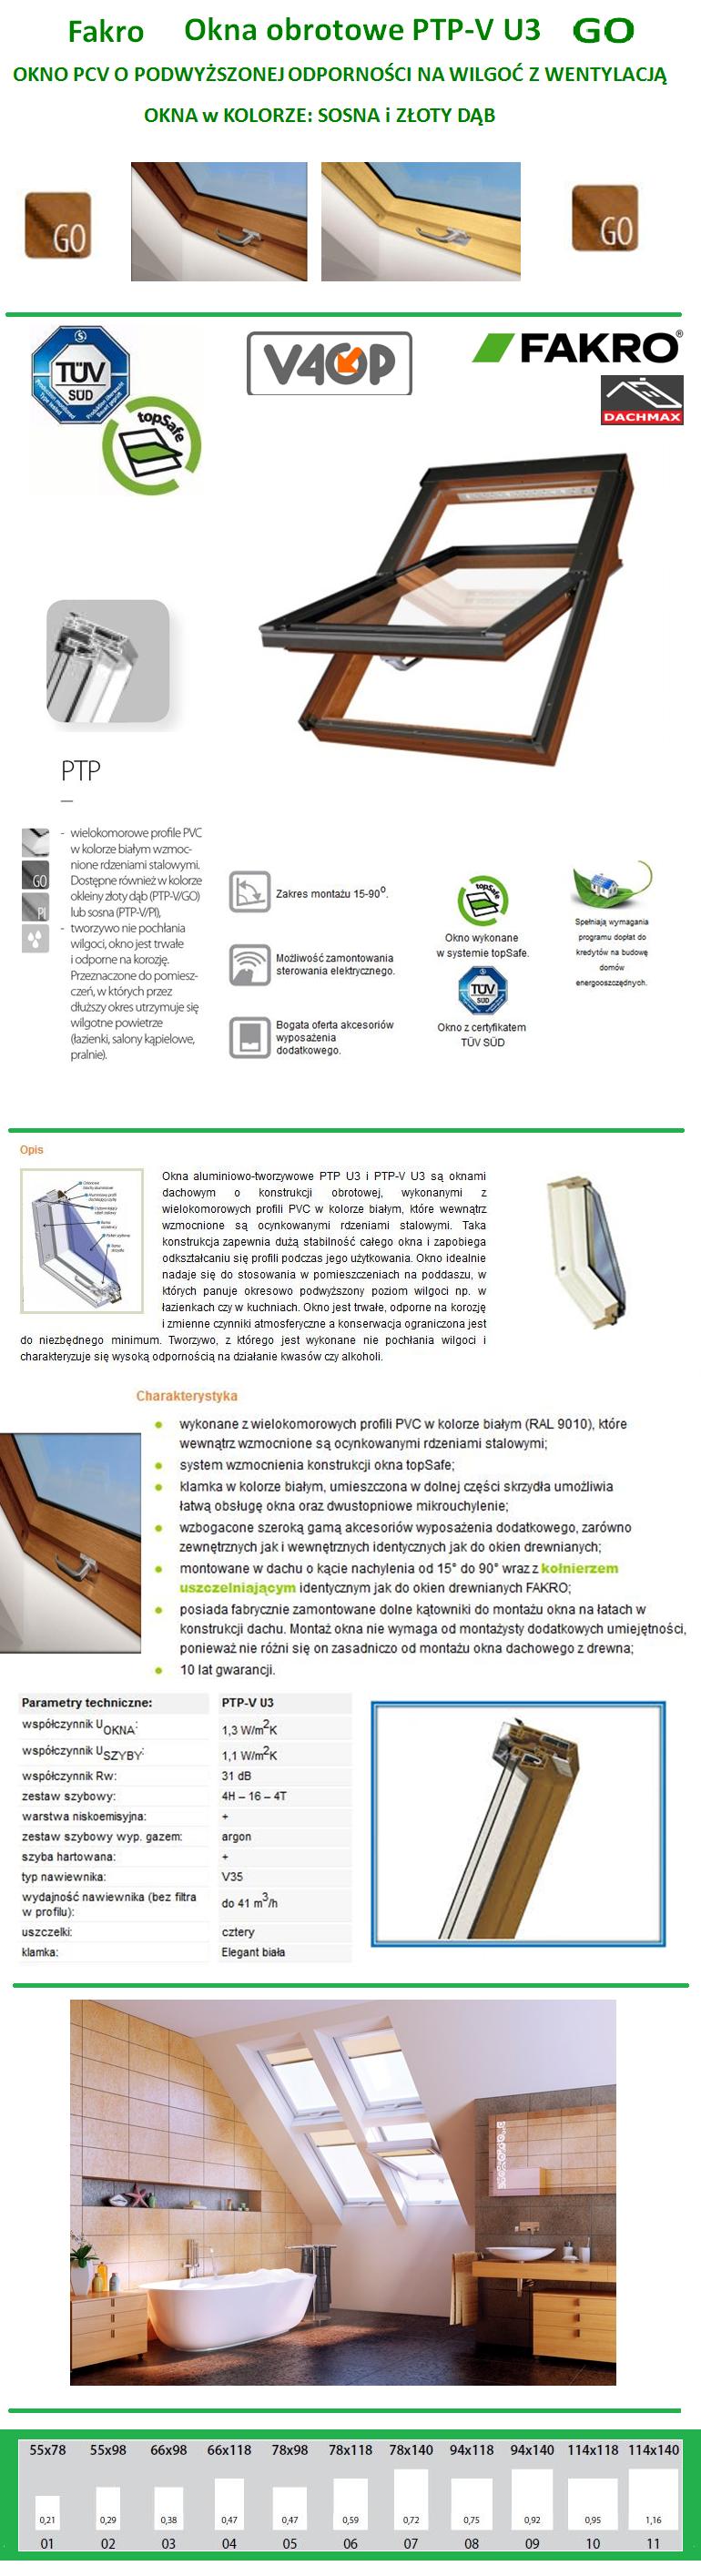 Okno Fakro PTP-V/GO U3 PCV Sosna Złoty Dąb O Podwyższonej Odporności Na Wilgoć